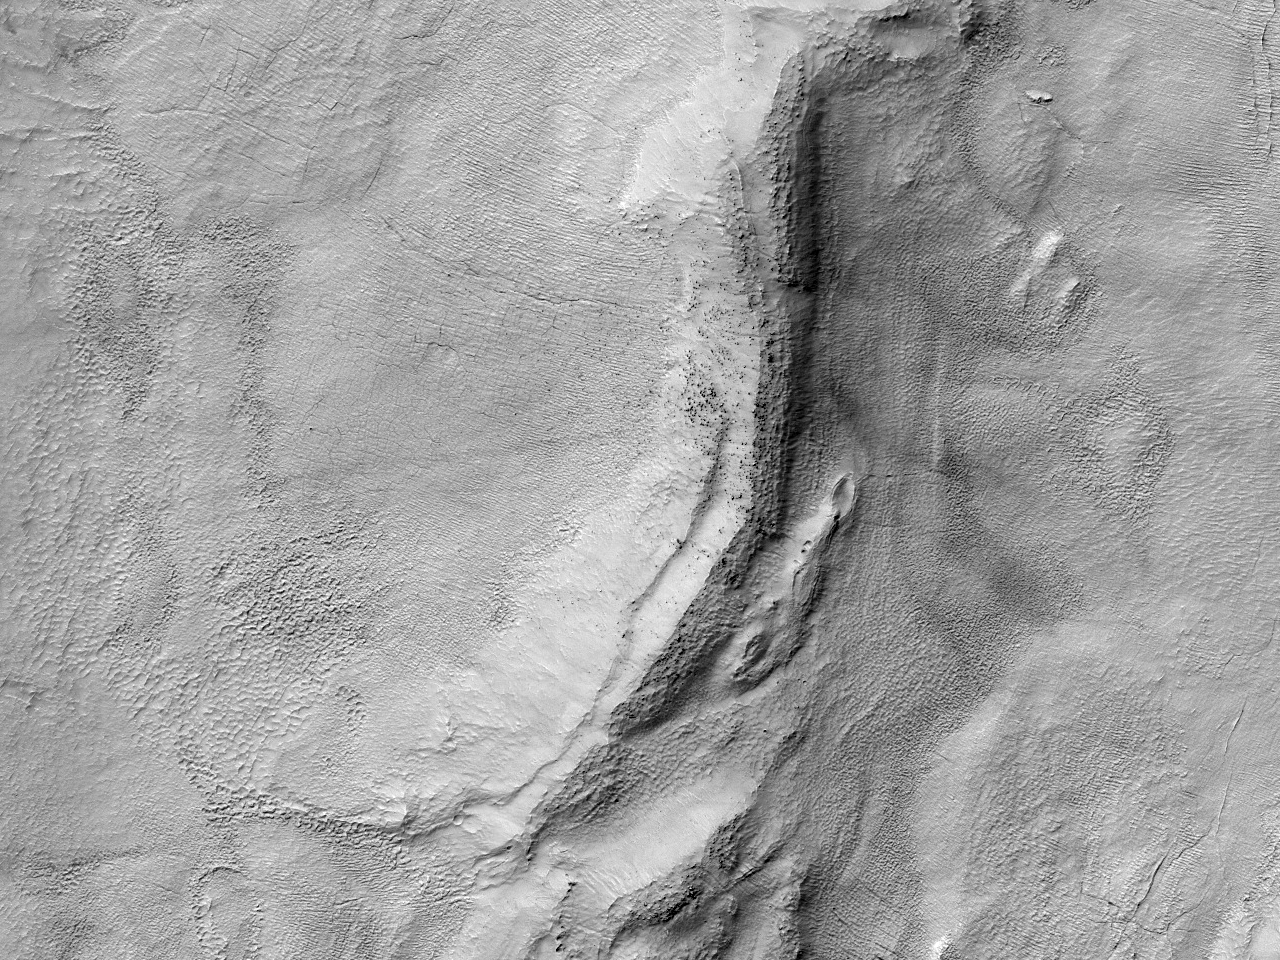 Дно равнины Hellas Planitia